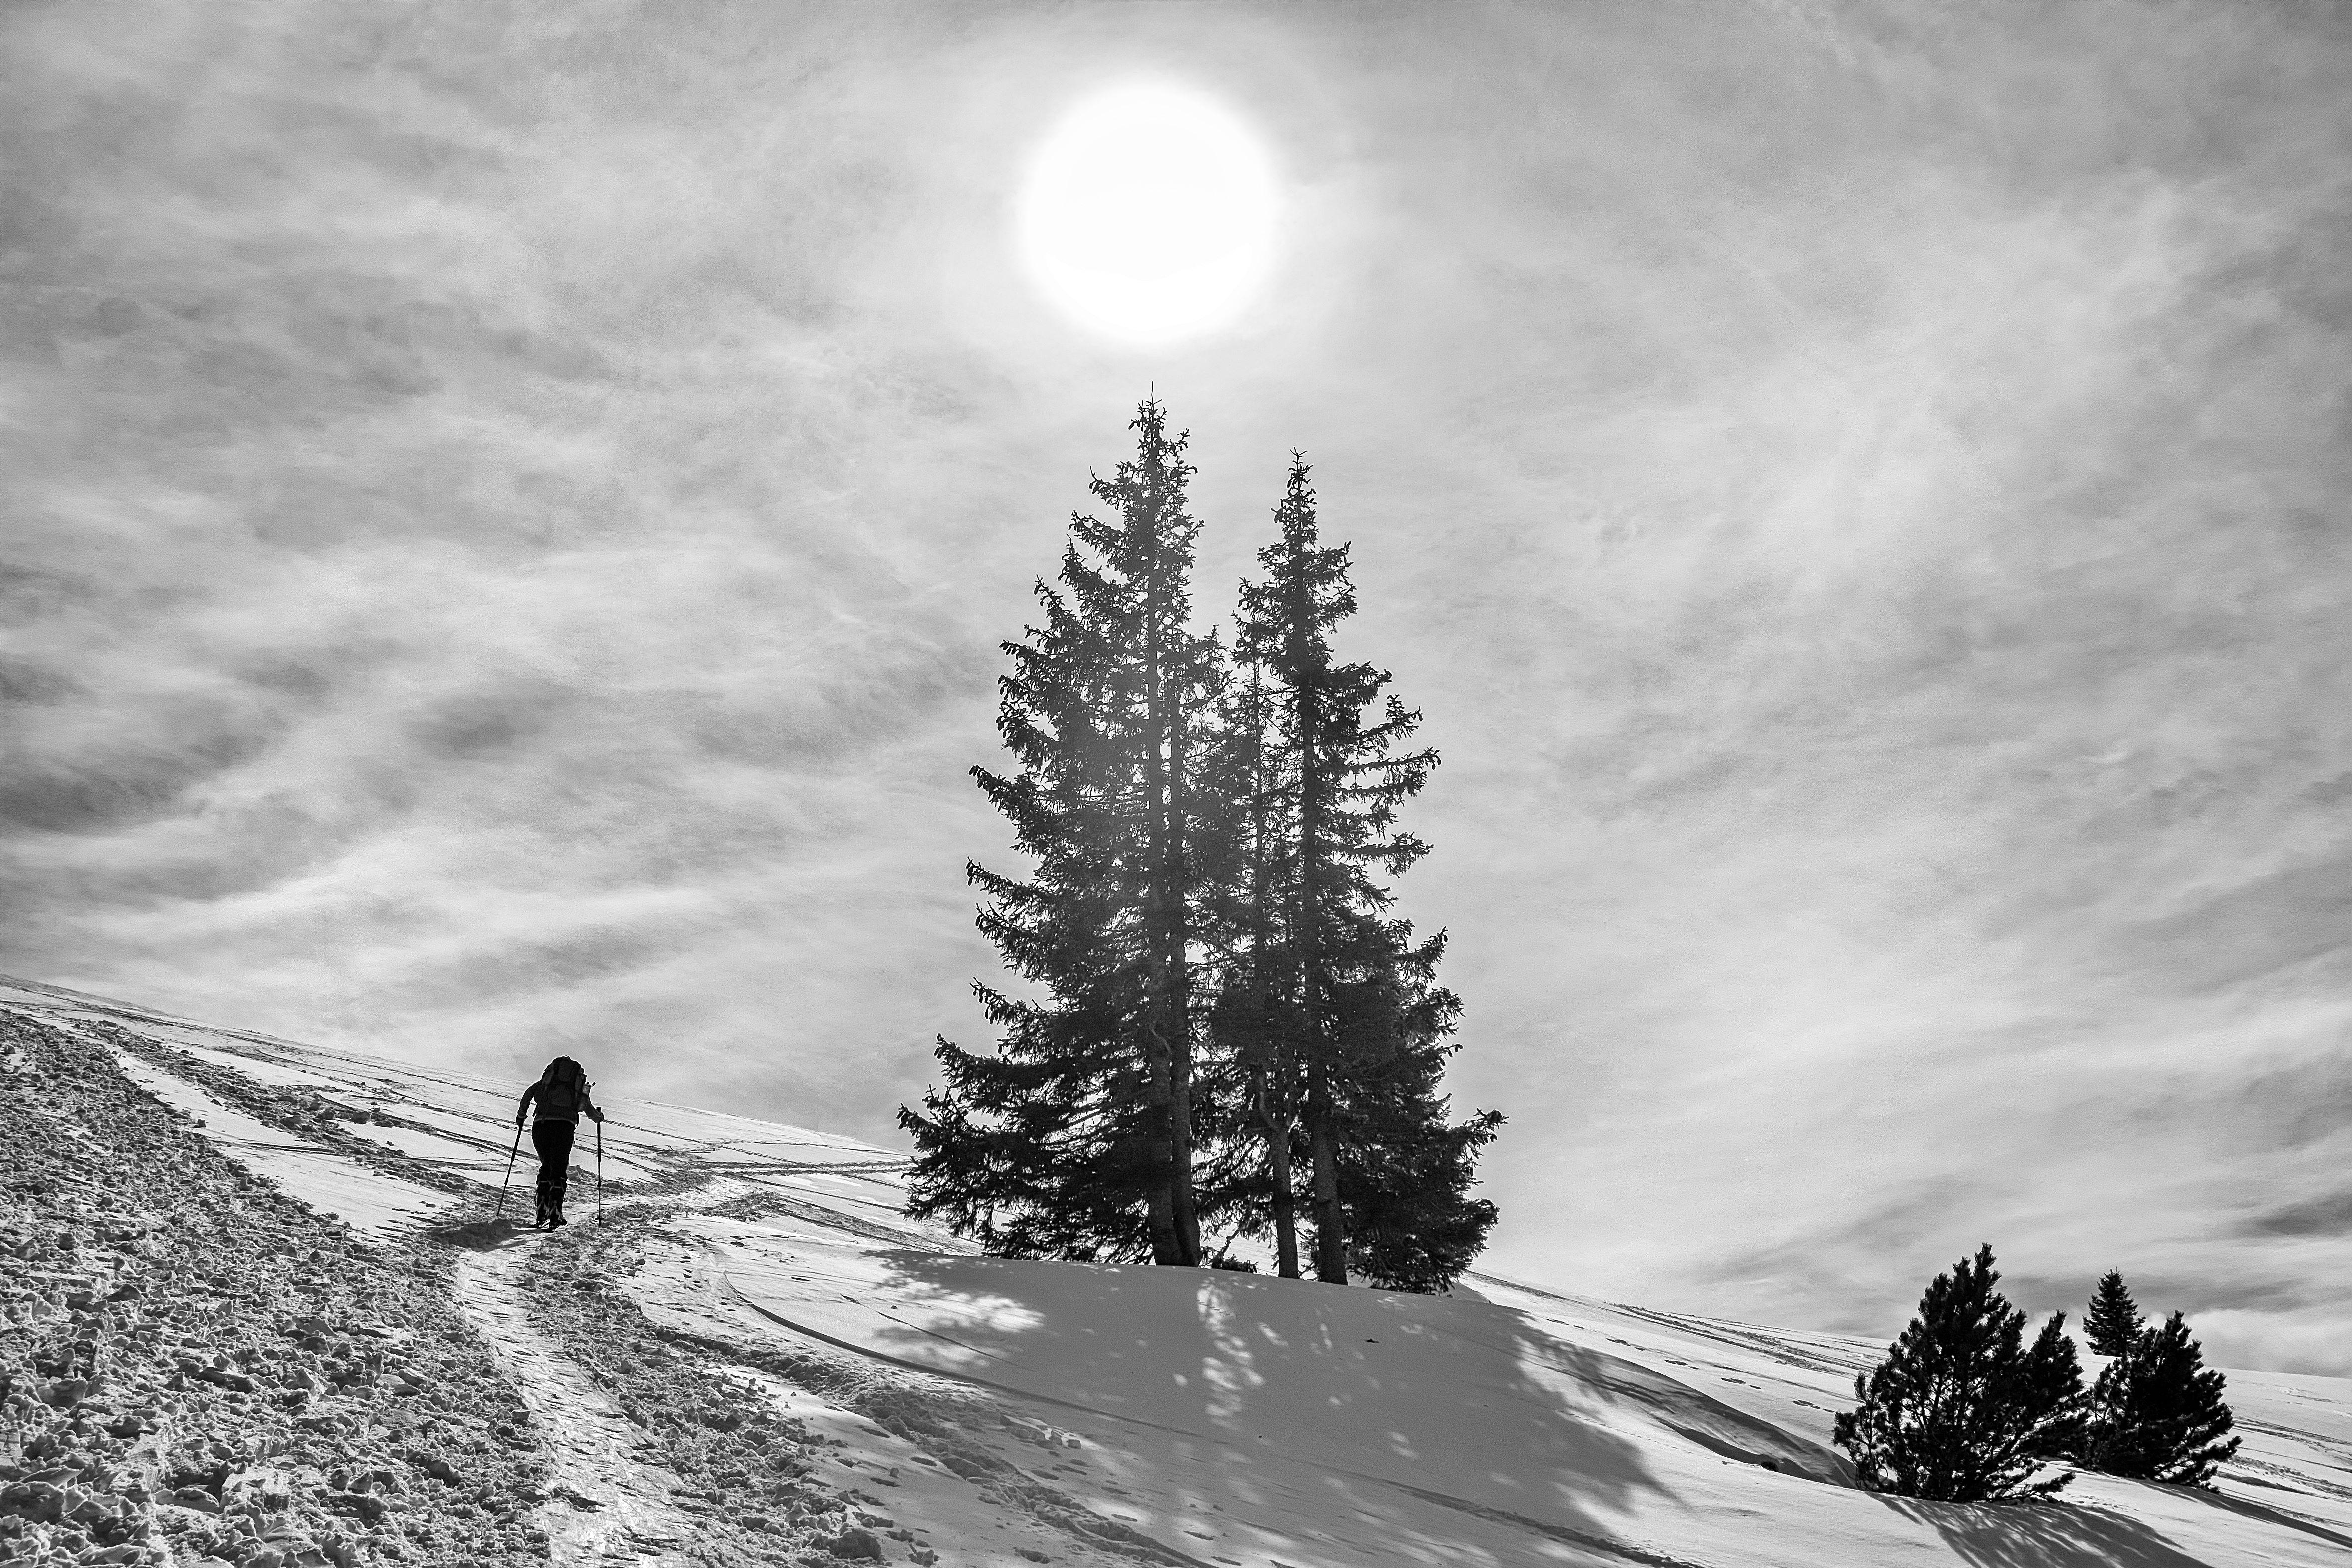 Sfondi Bianca Montagne Monocromo La Neve Inverno Austria